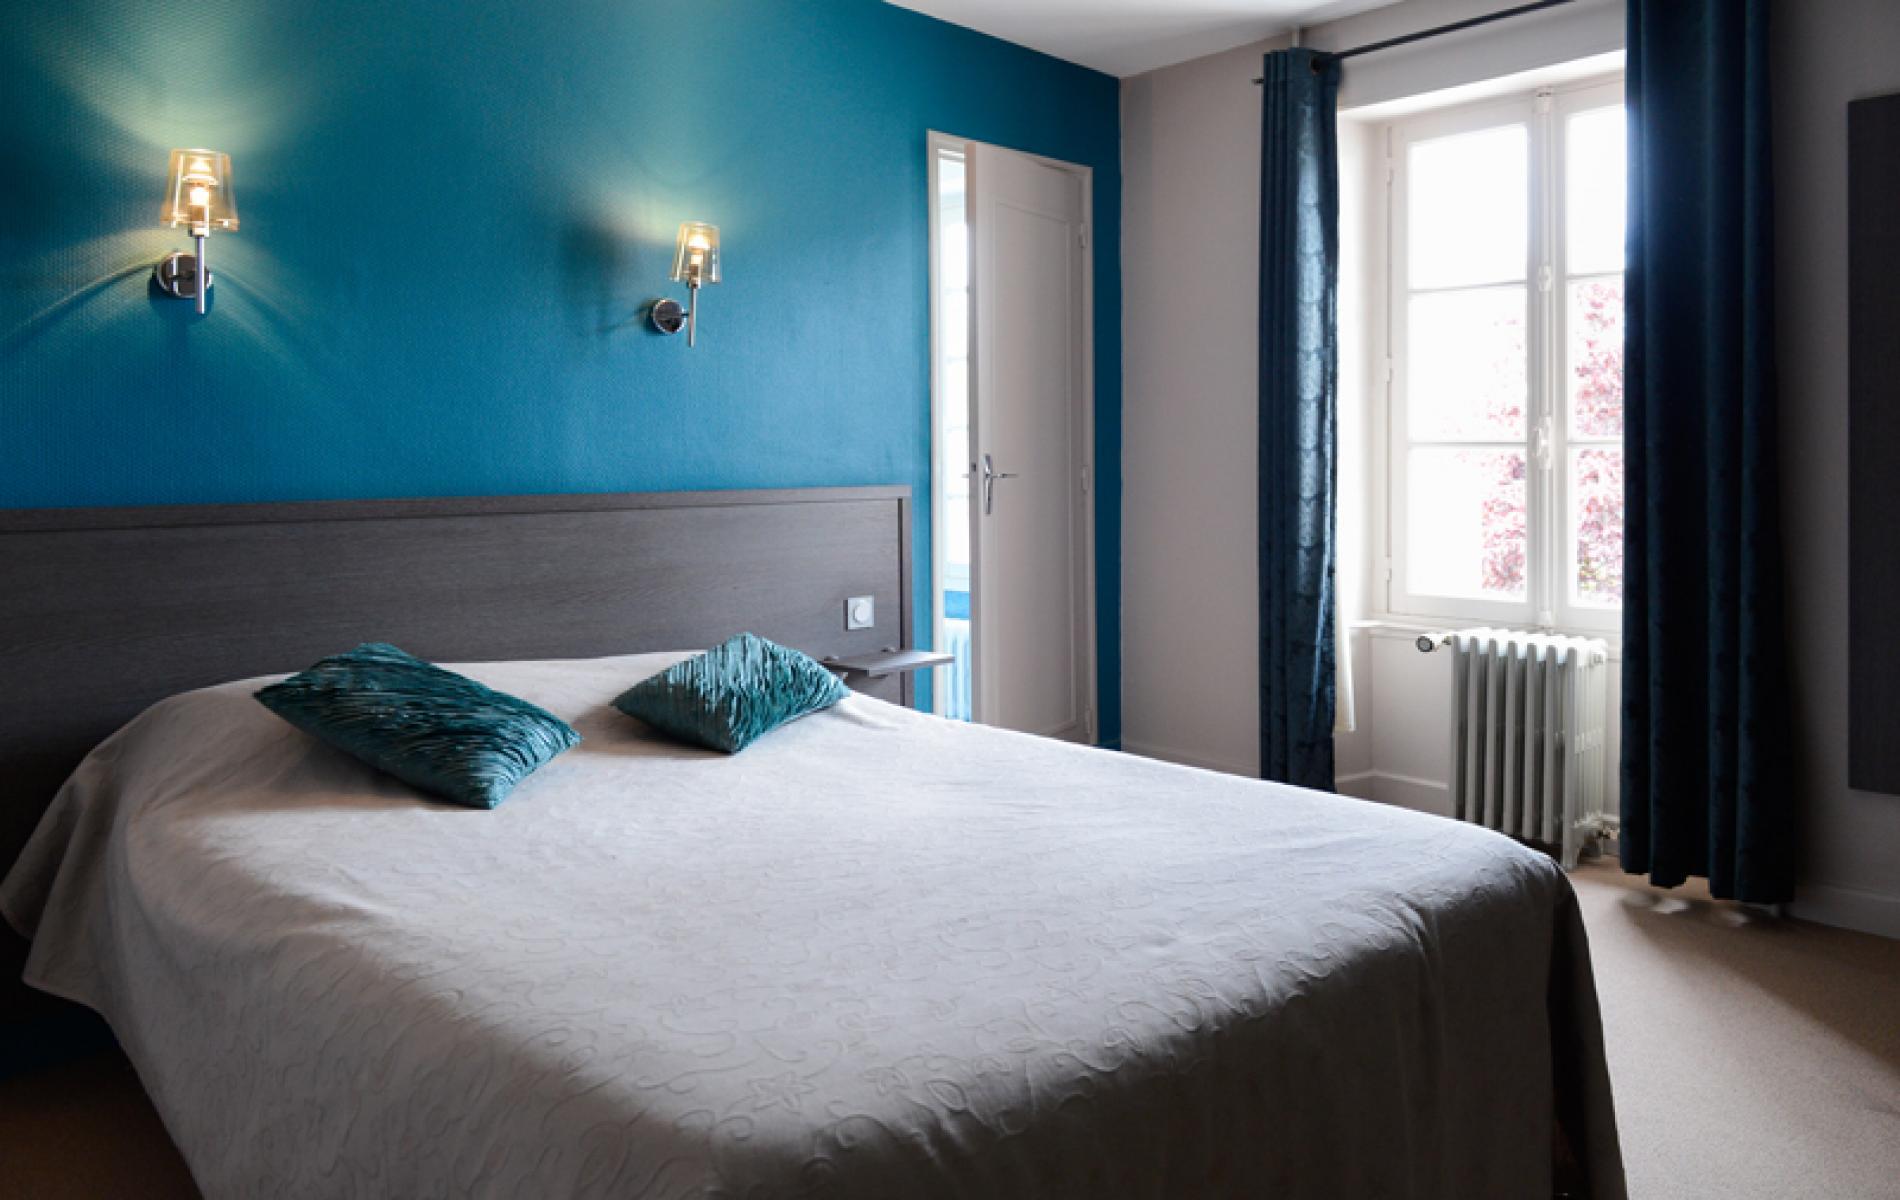 Hôtel proche Alençon, Orne